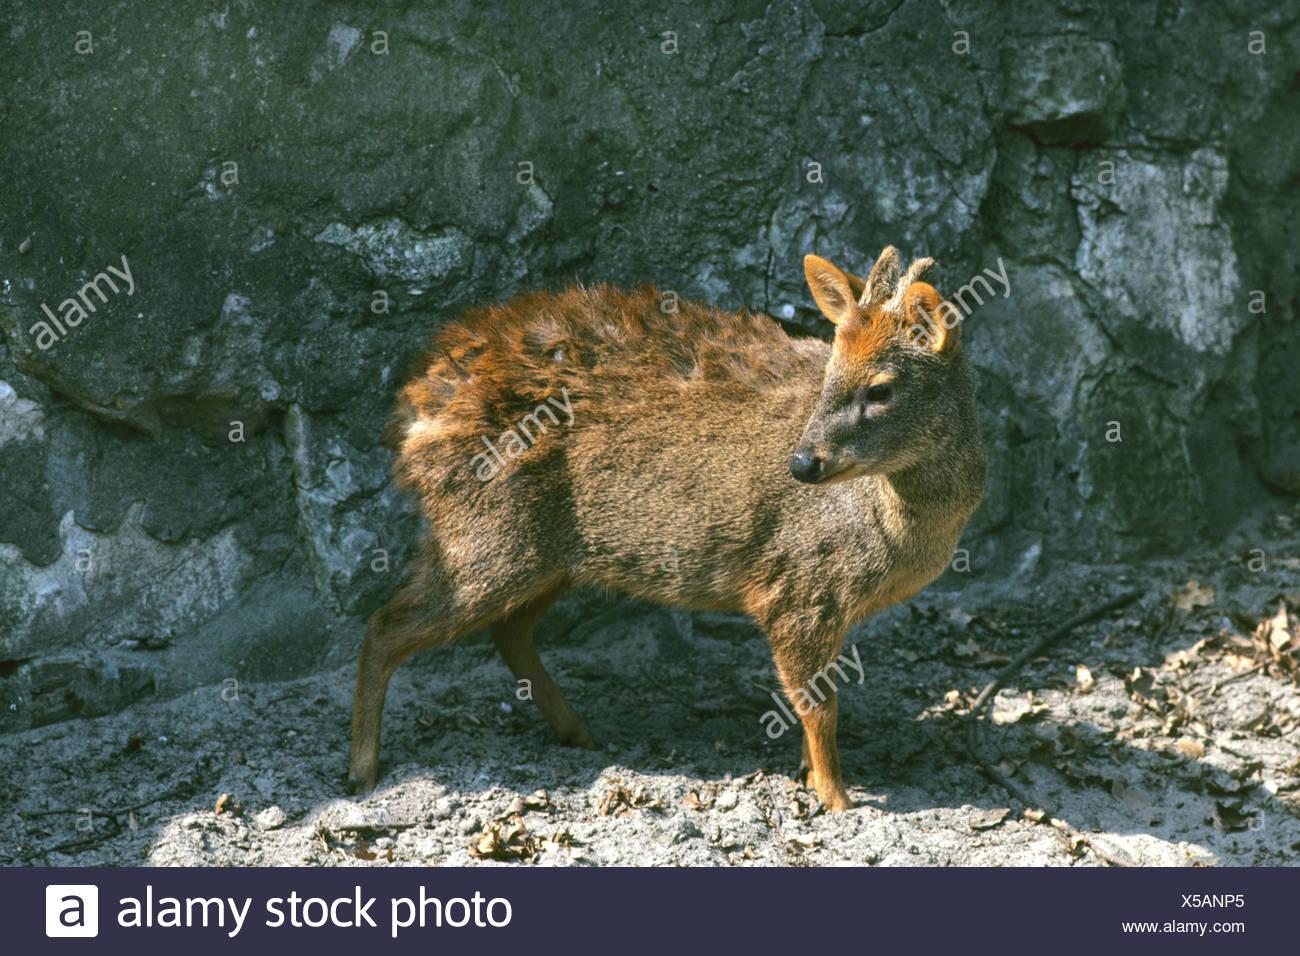 Chilean Pudu, Southern Pudu (Pudu puda), in outdoor enclosure - Stock Image